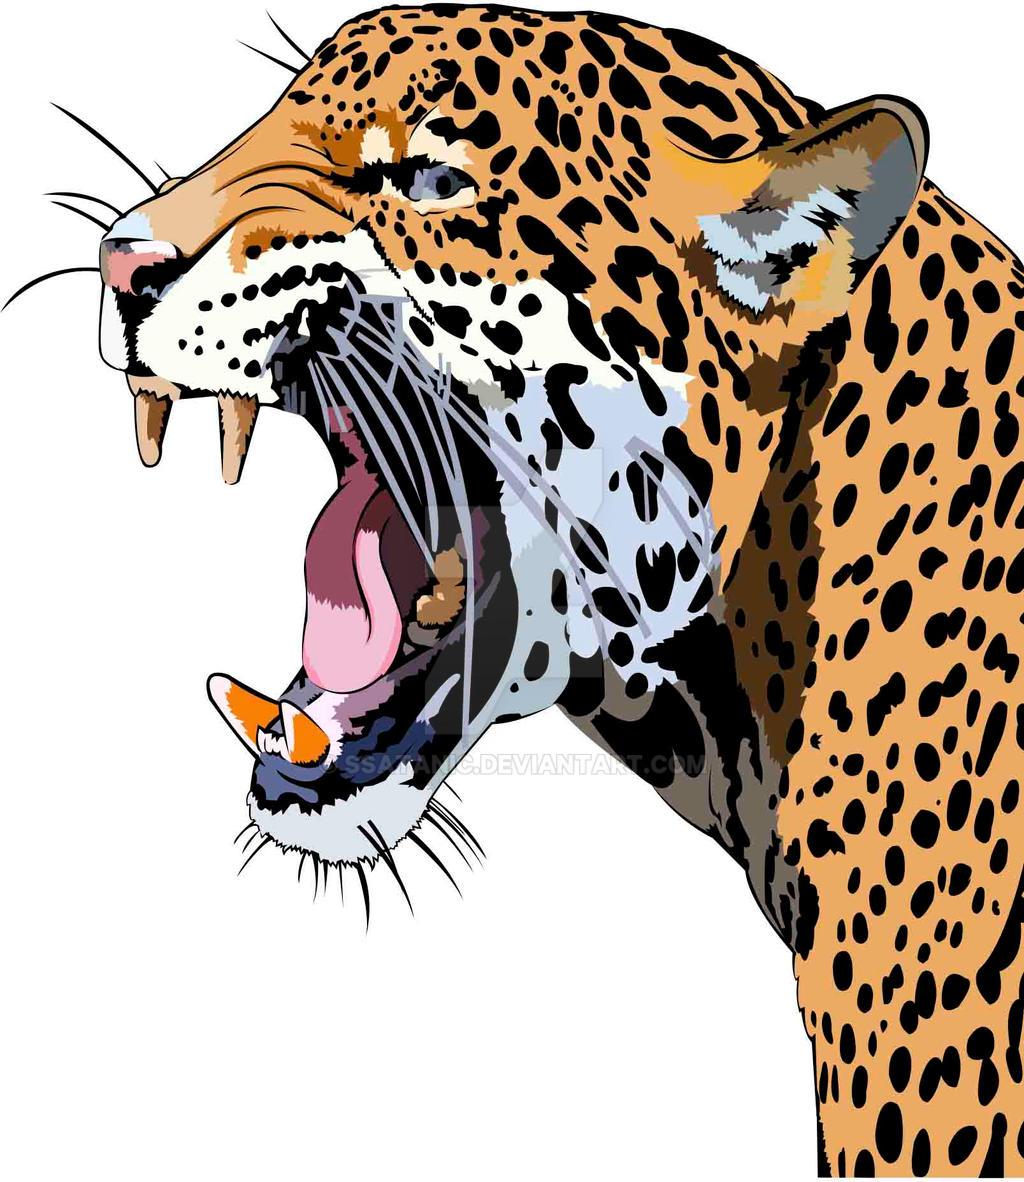 Angry Jaguar: Angry-jaguar By Ssatanic On DeviantArt